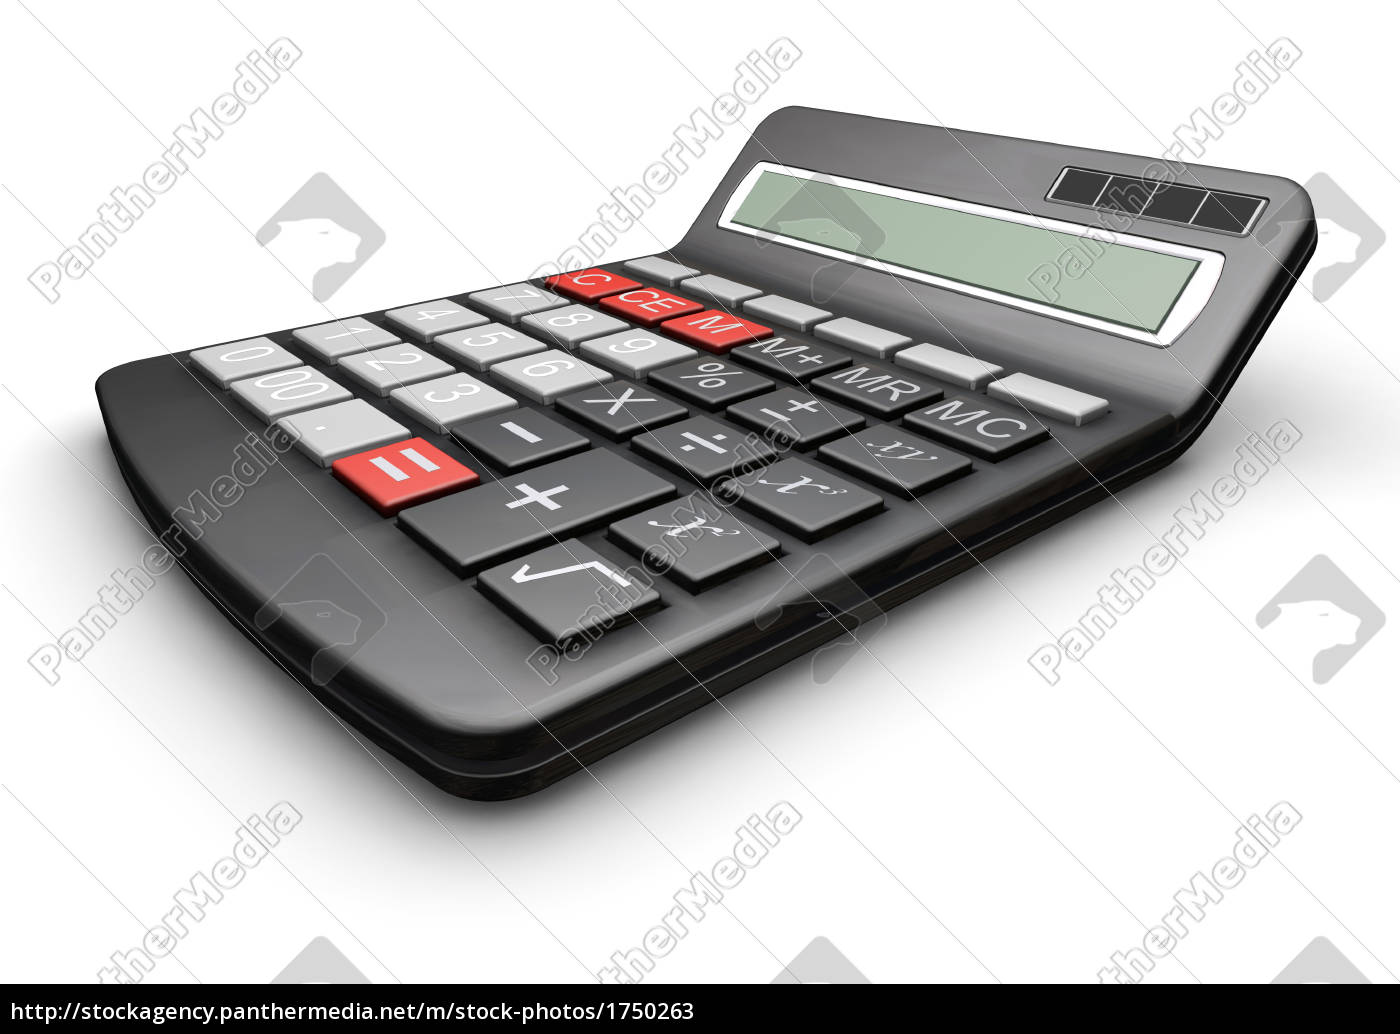 calculator - 1750263